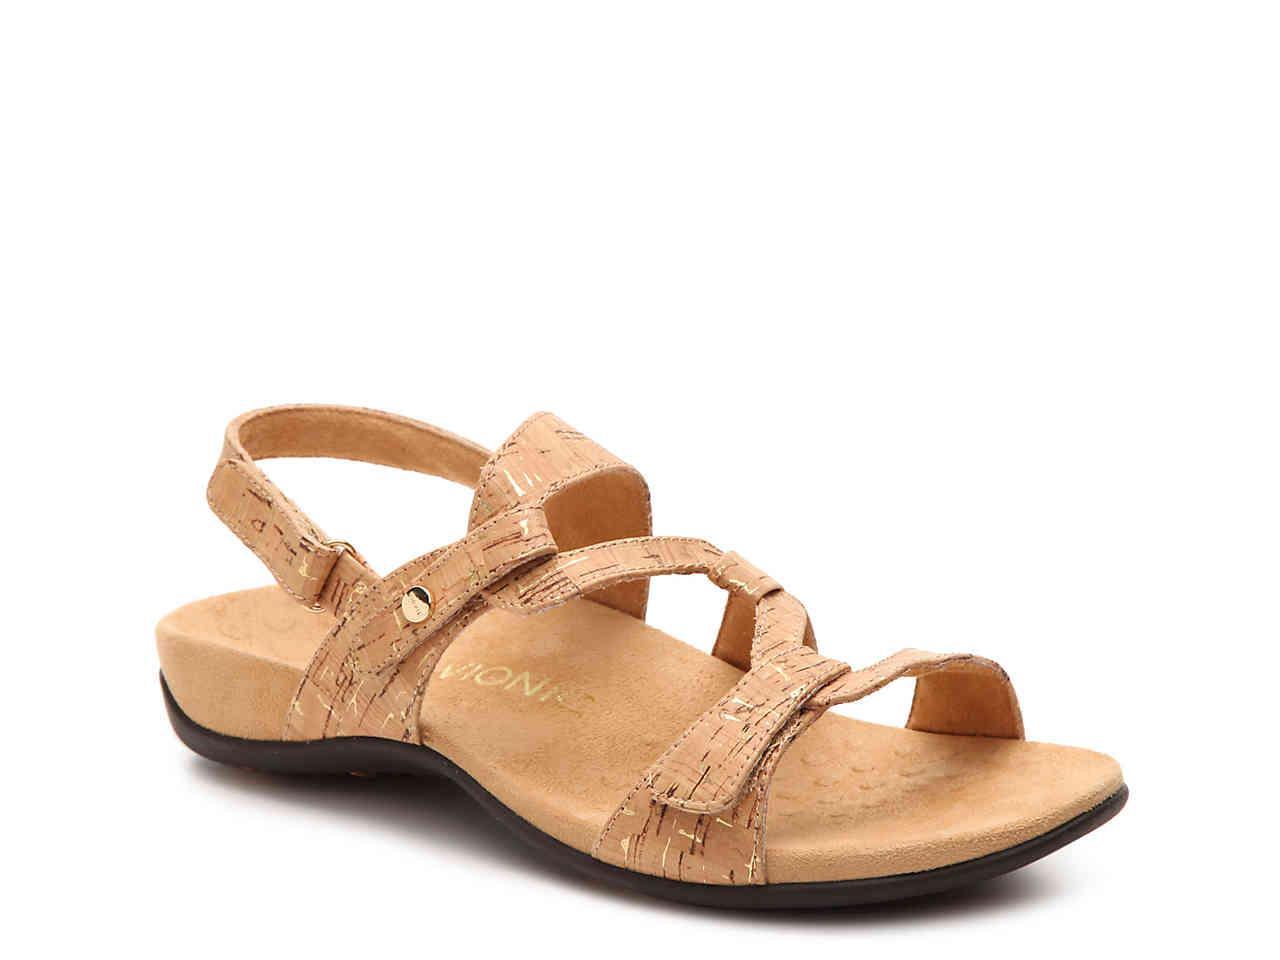 e3158d1c78f0 Lyst - Vionic Paros Flat Sandal